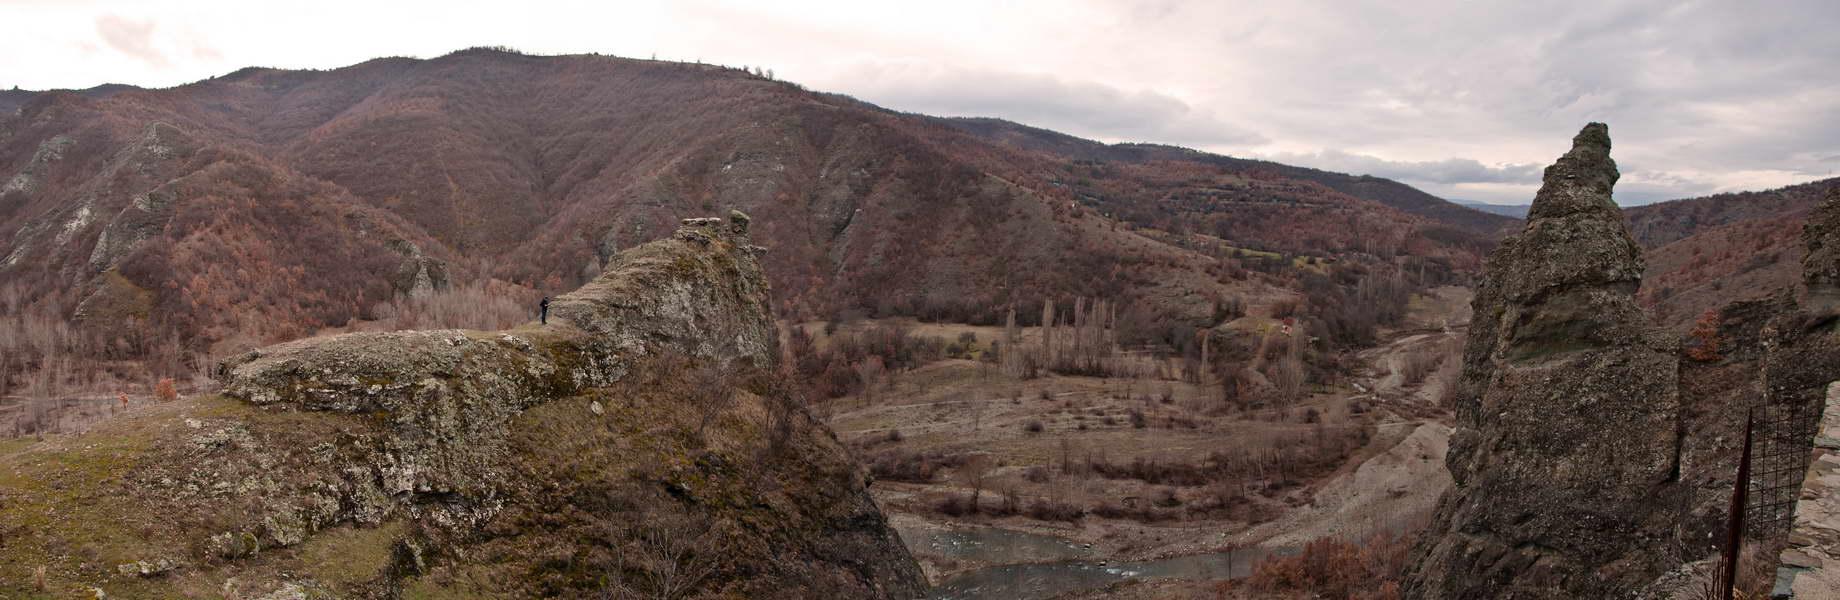 Panorama Vražjeg kamena